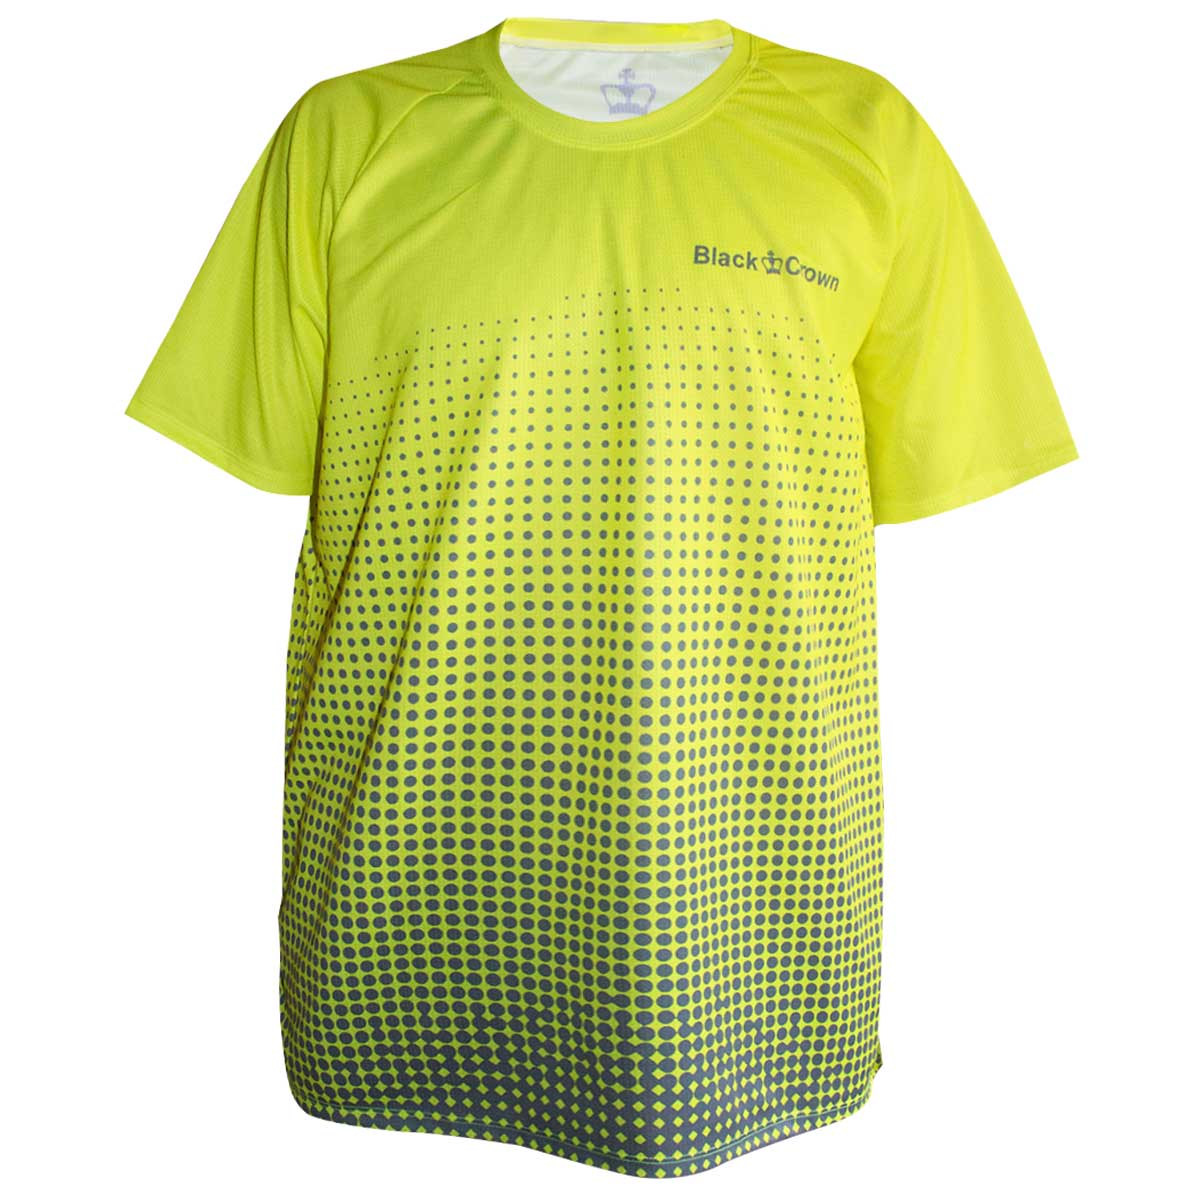 Camiseta Black Crown Miami amarillo-gris